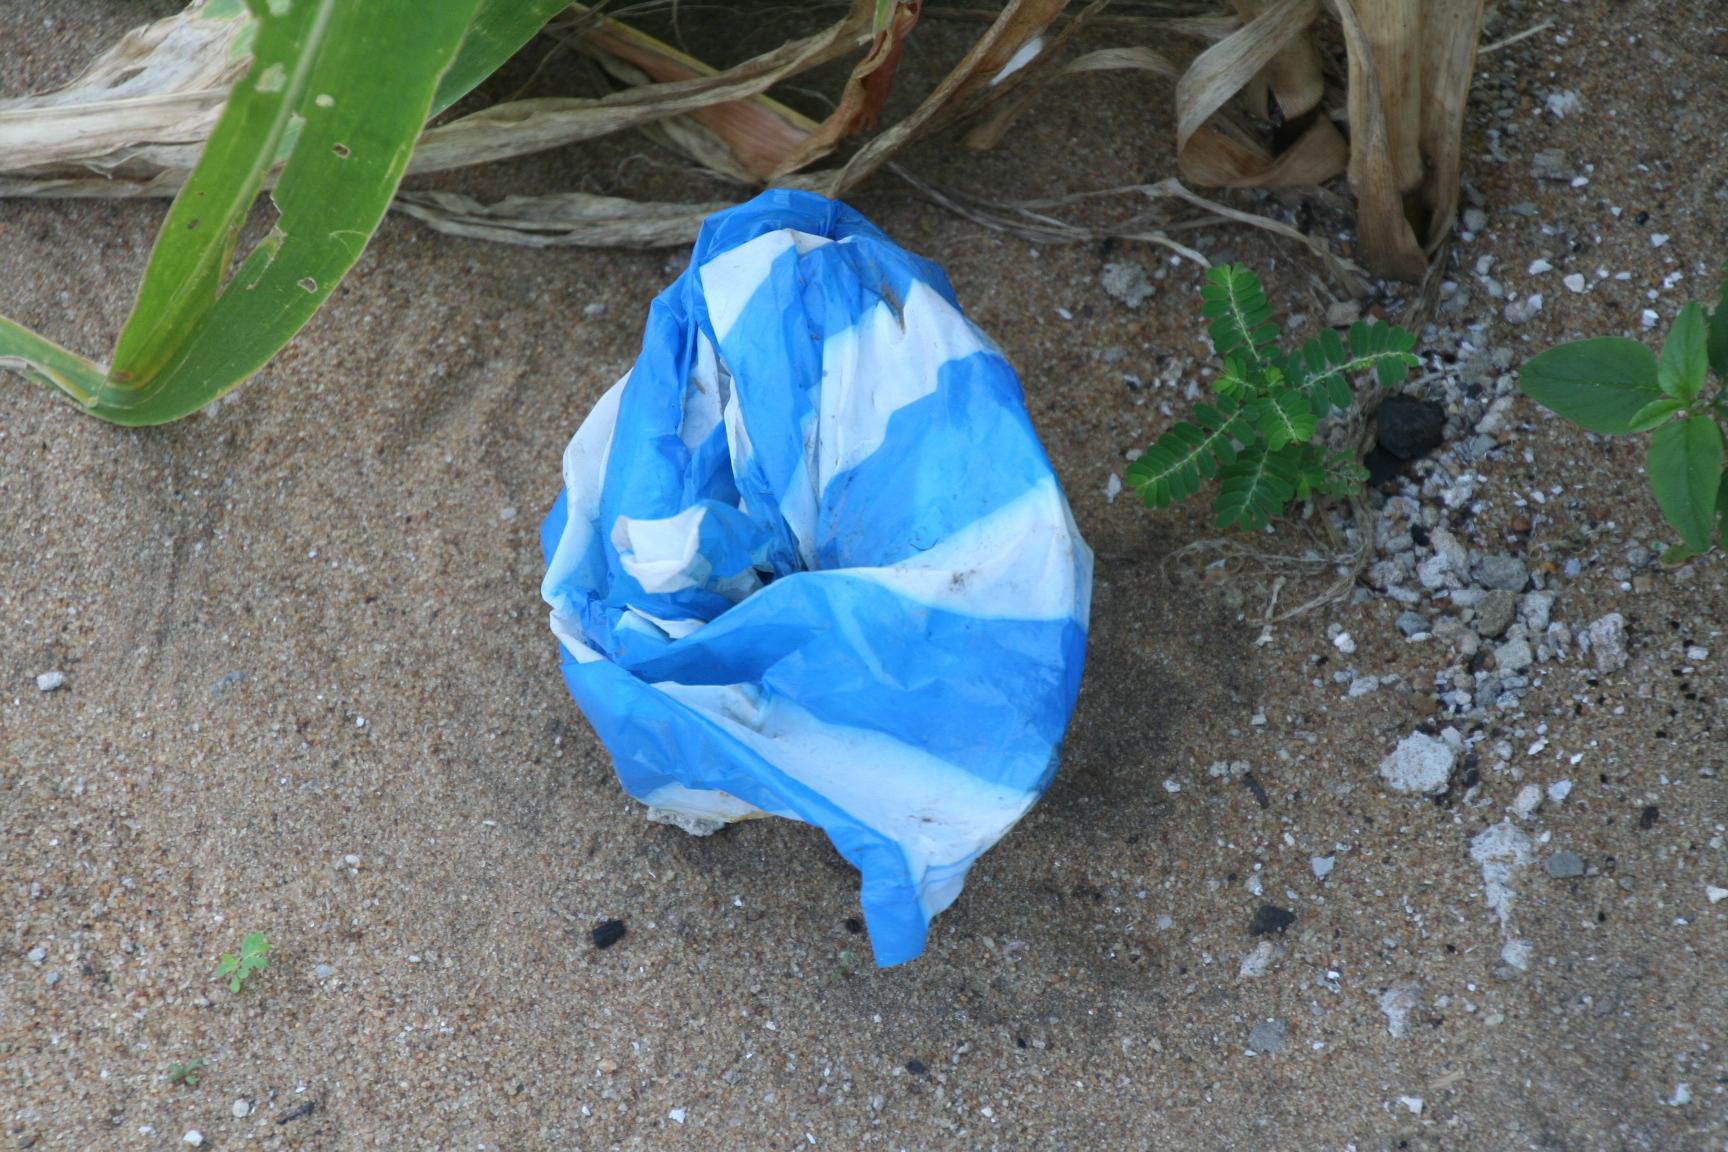 2. Plastiksäcke werden achtlos weggeschmissen.